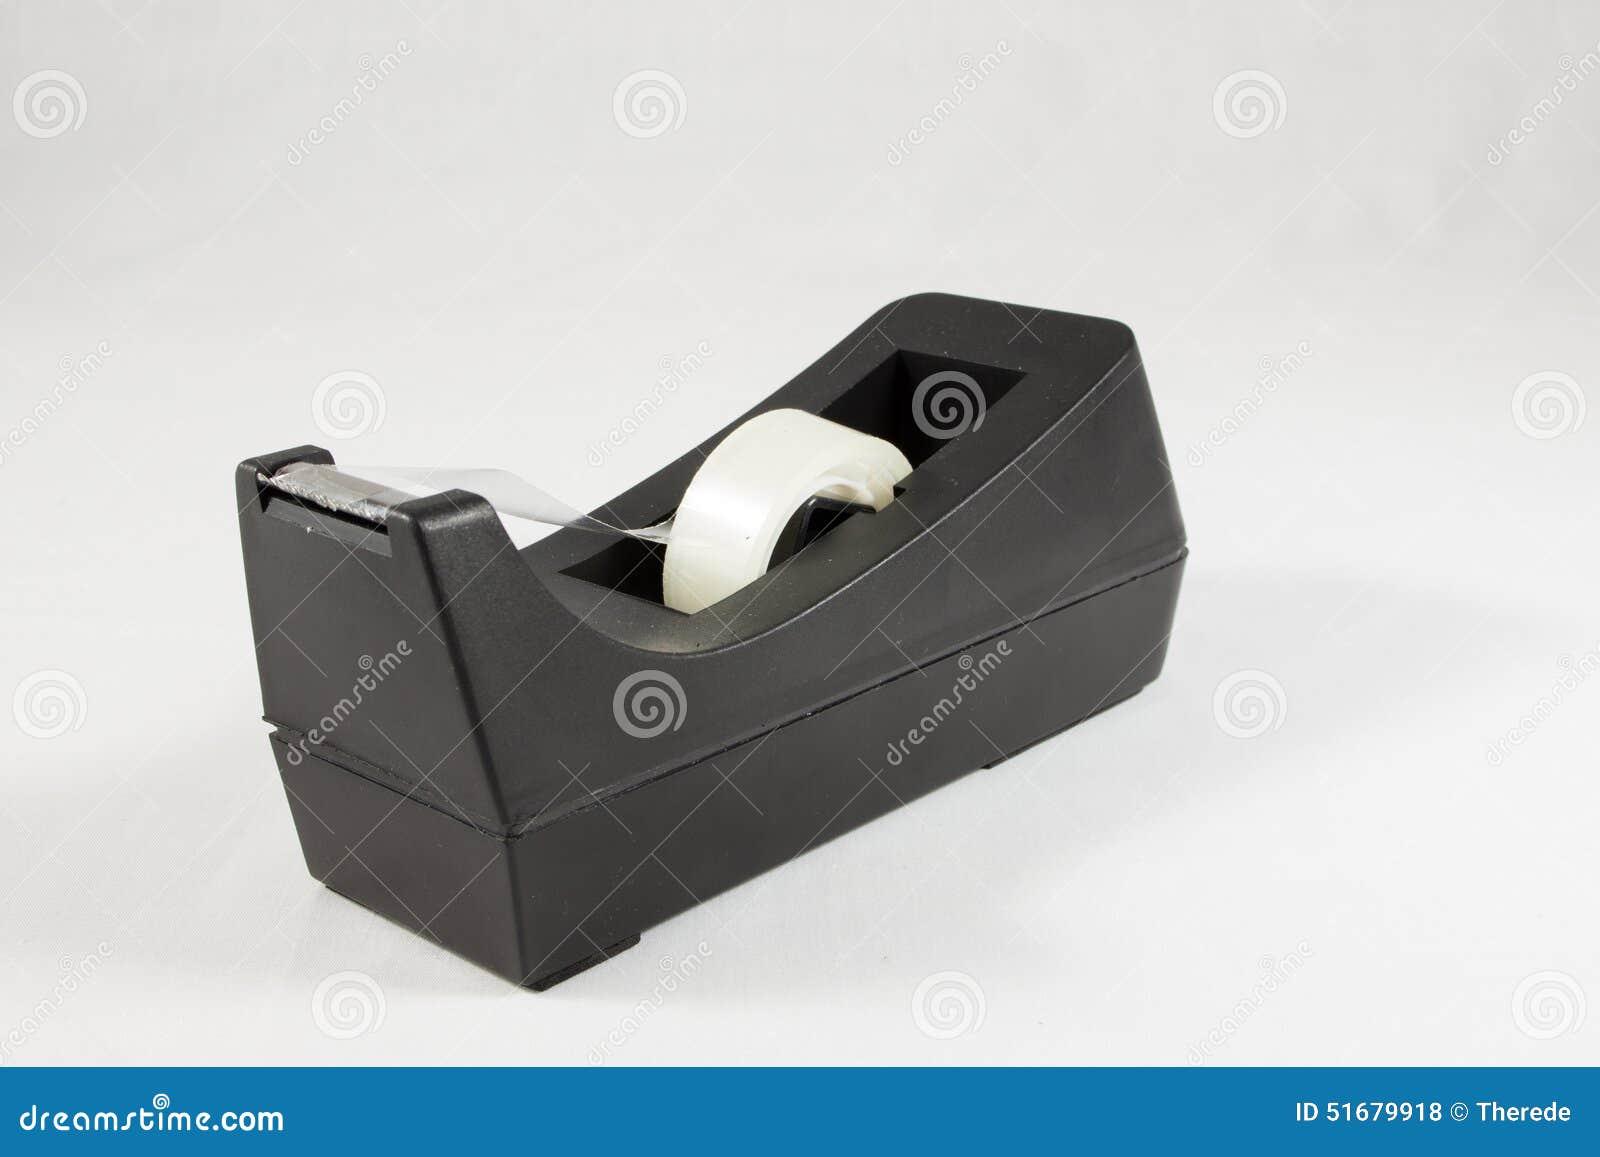 Scotch tape dispenser side view